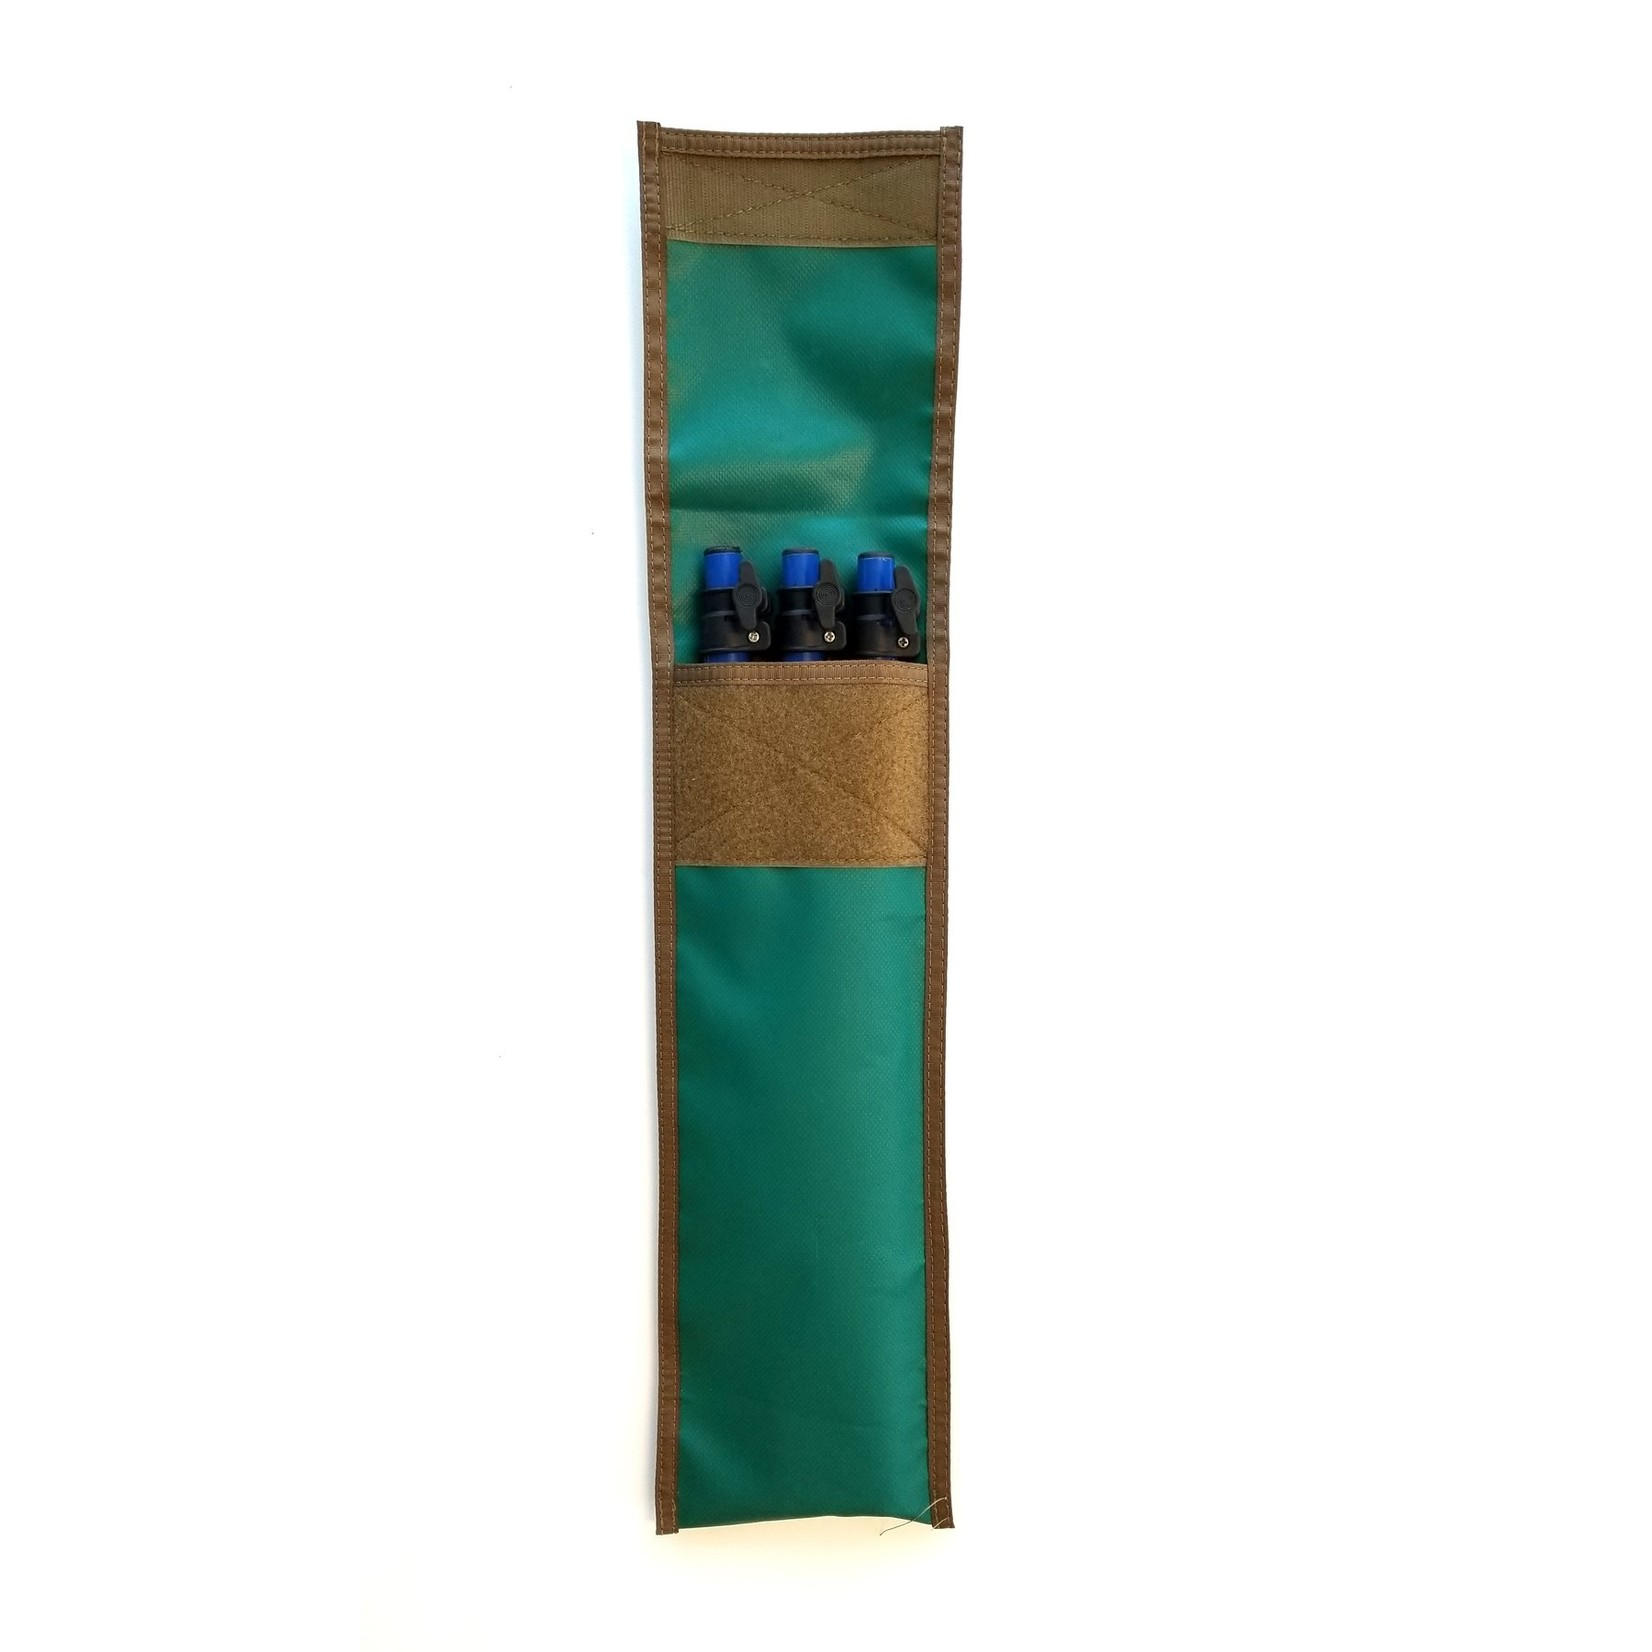 Tembo Tusk Tembo Tusk Skottle Adjustable Leg Grill Kit